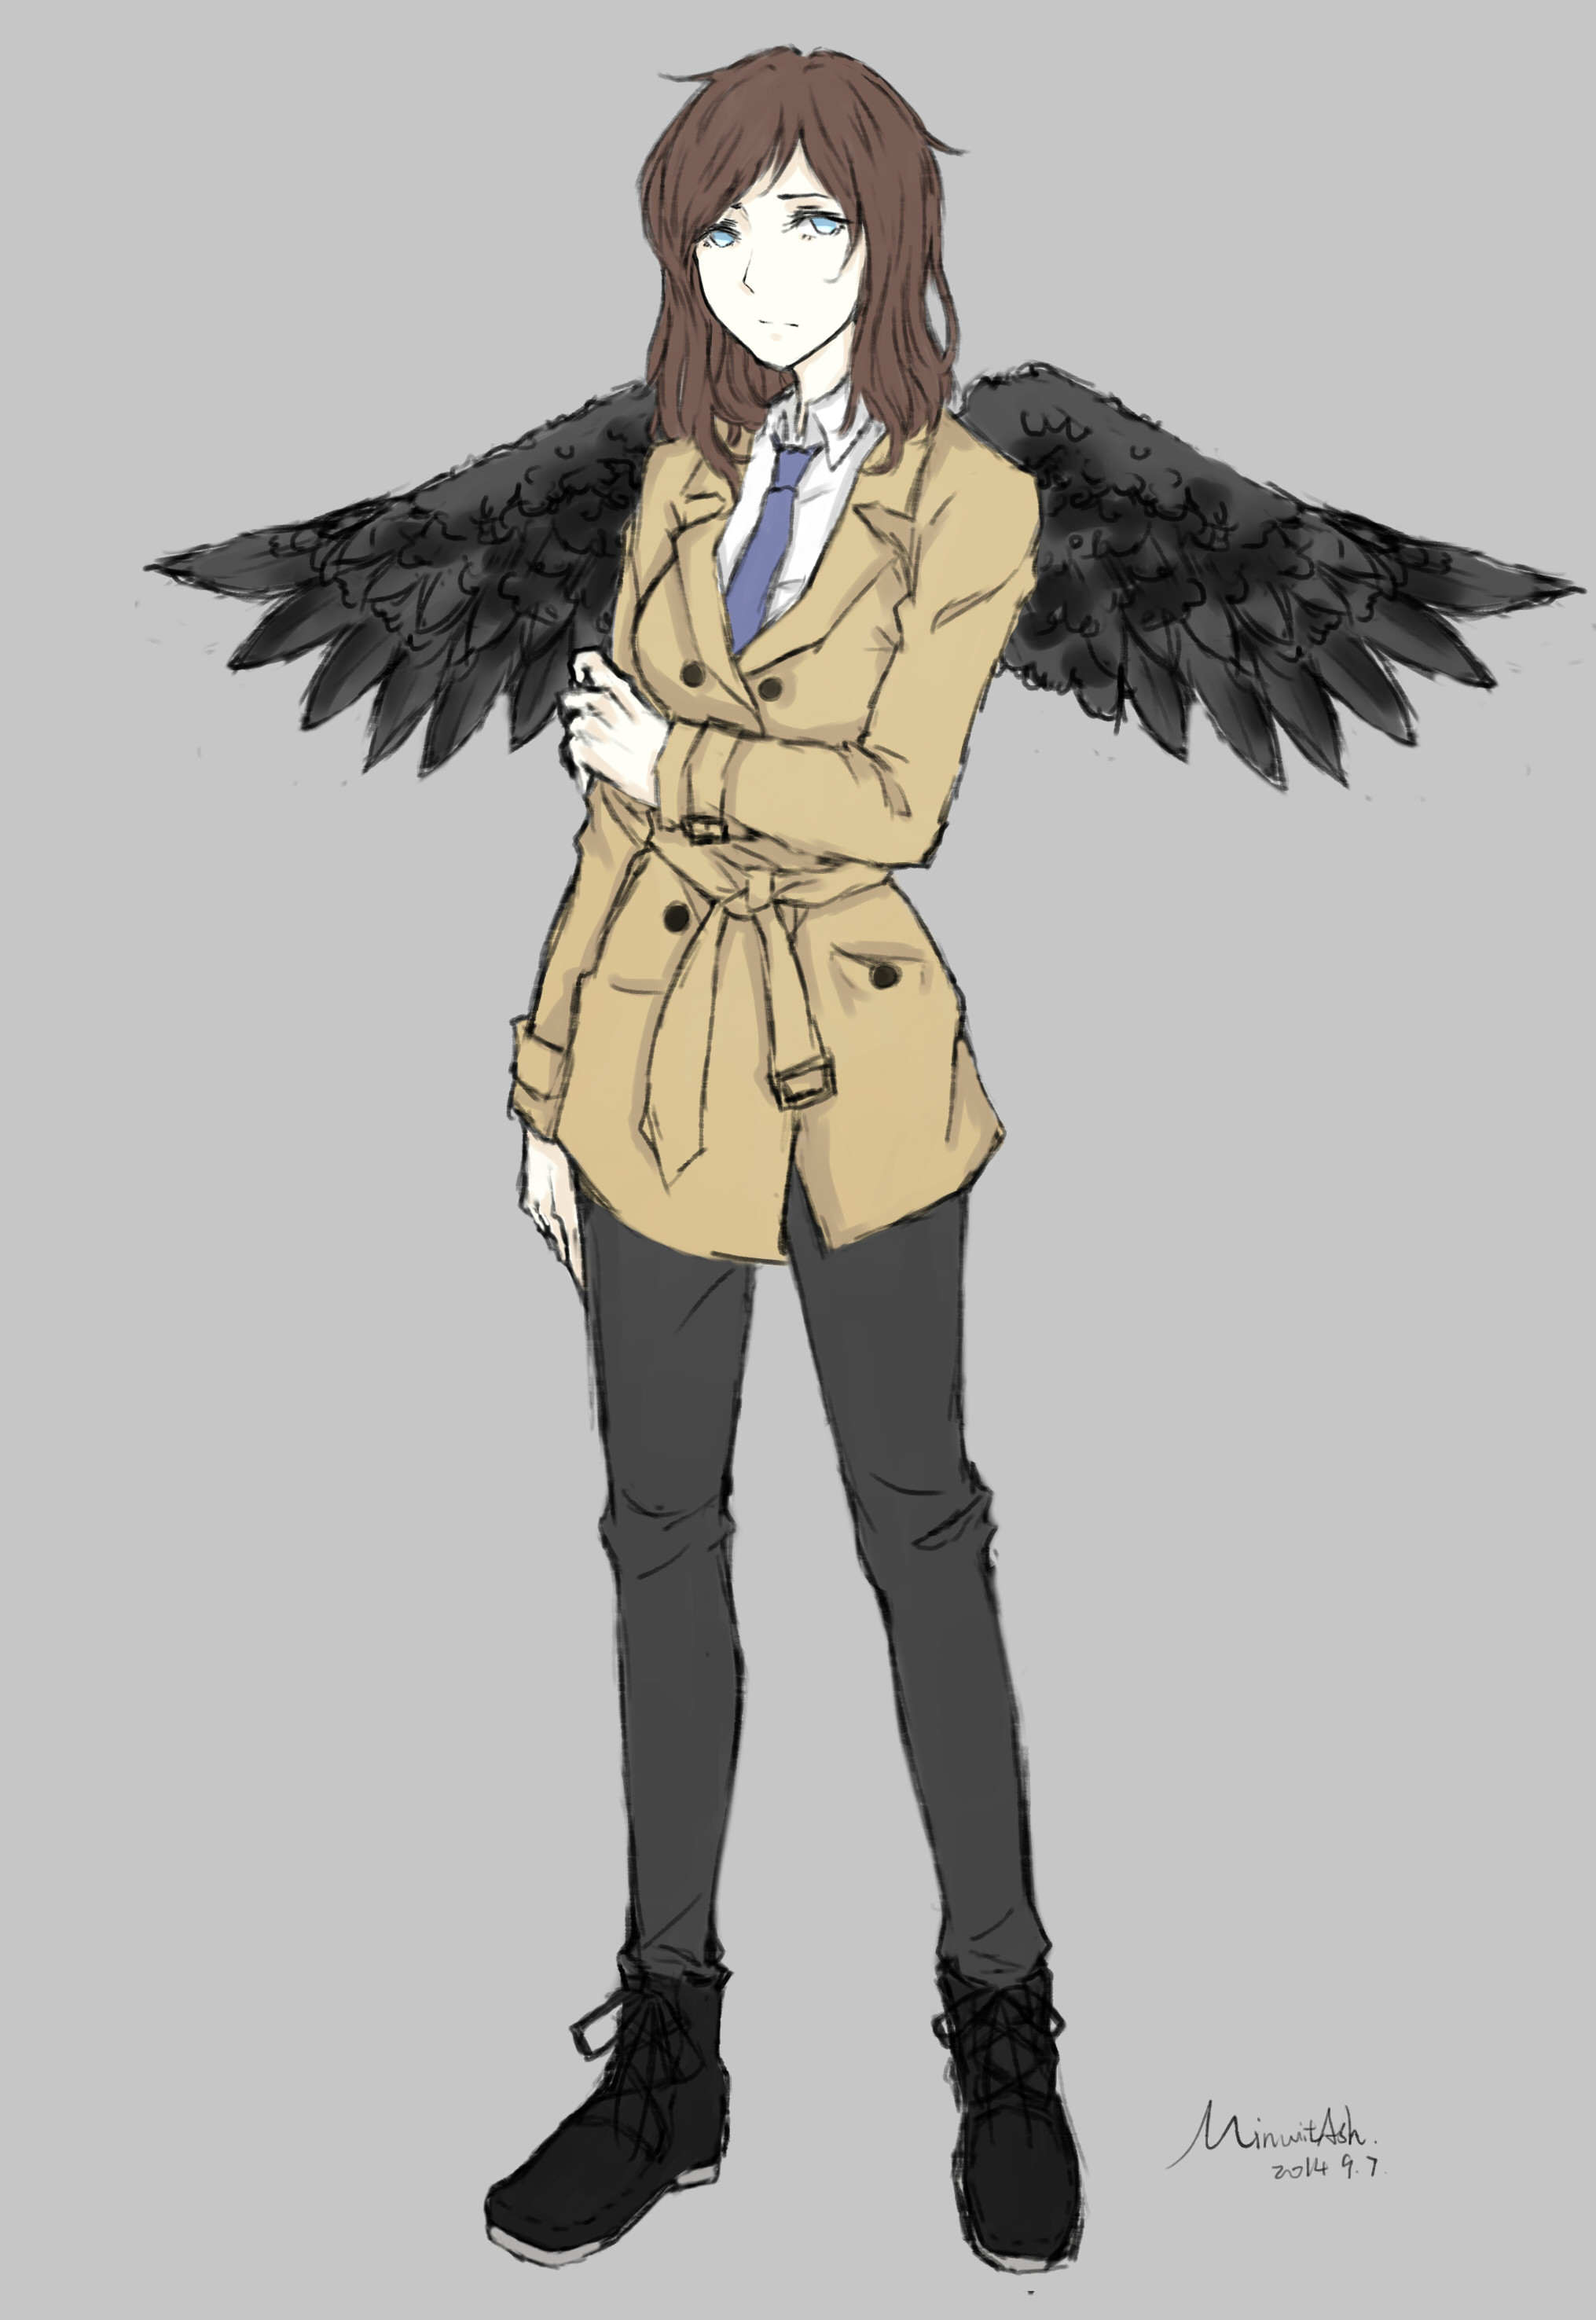 Tags: Anime, Pixiv Id 5210648, Supernatural, Castiel, Trench Coat, Pixiv